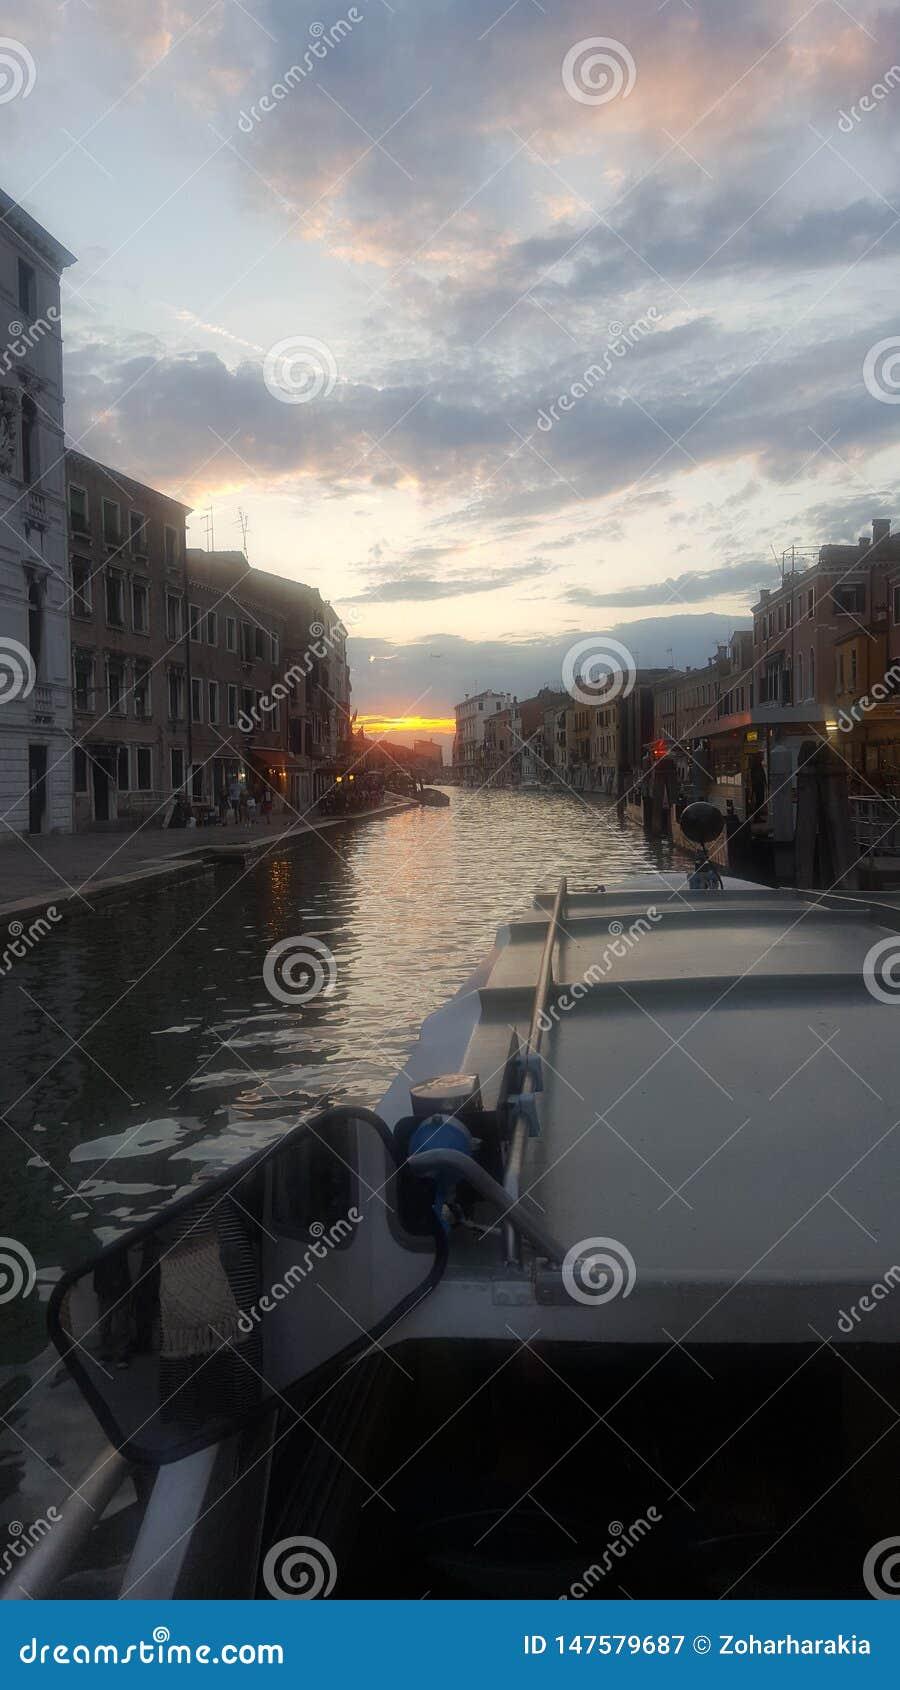 Kanal in Venedig am Sonnenuntergang